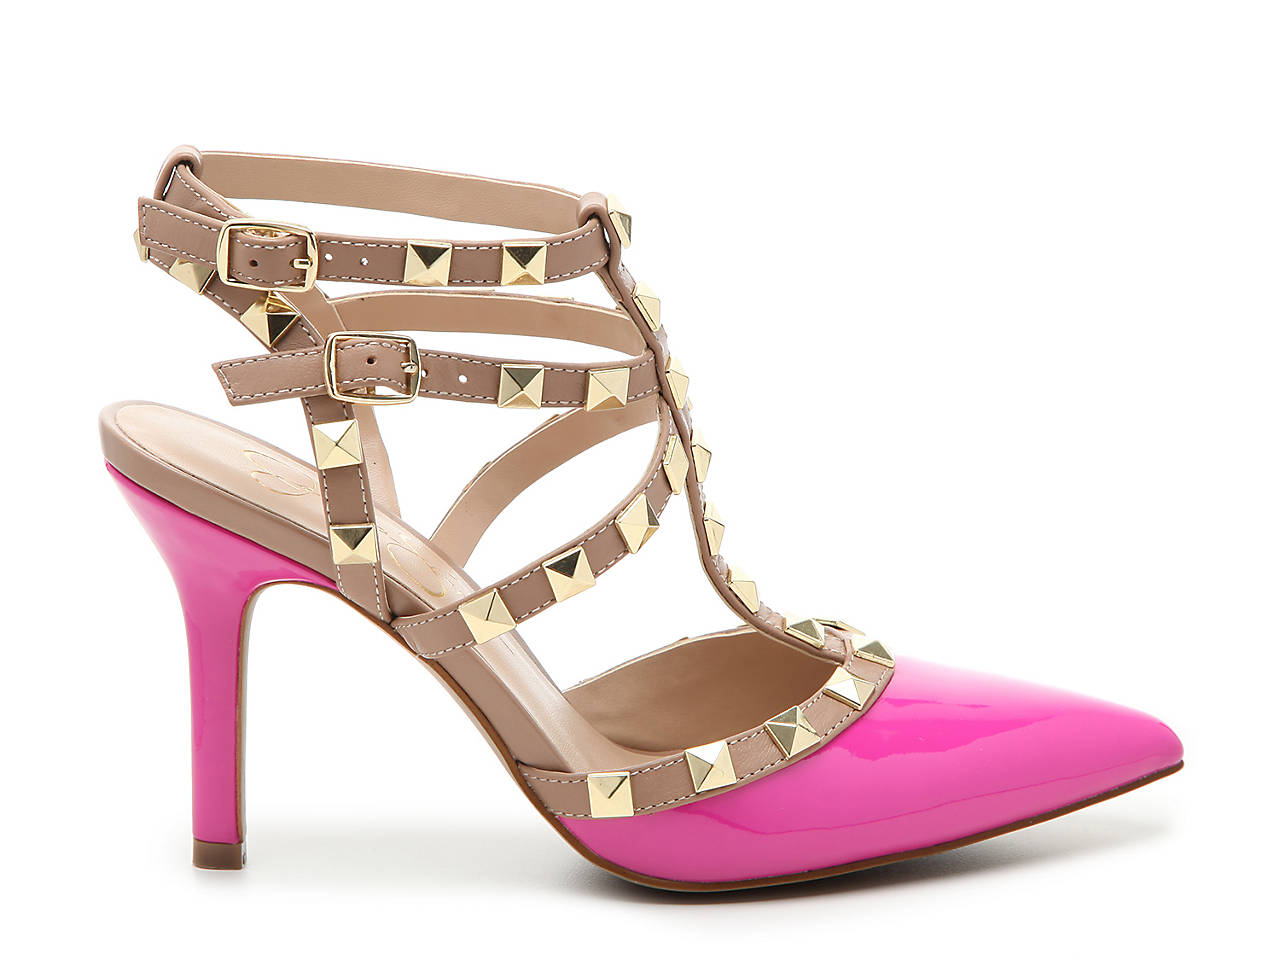 f86c54db93e6 Jessica Simpson Dameera Pump Women s Shoes